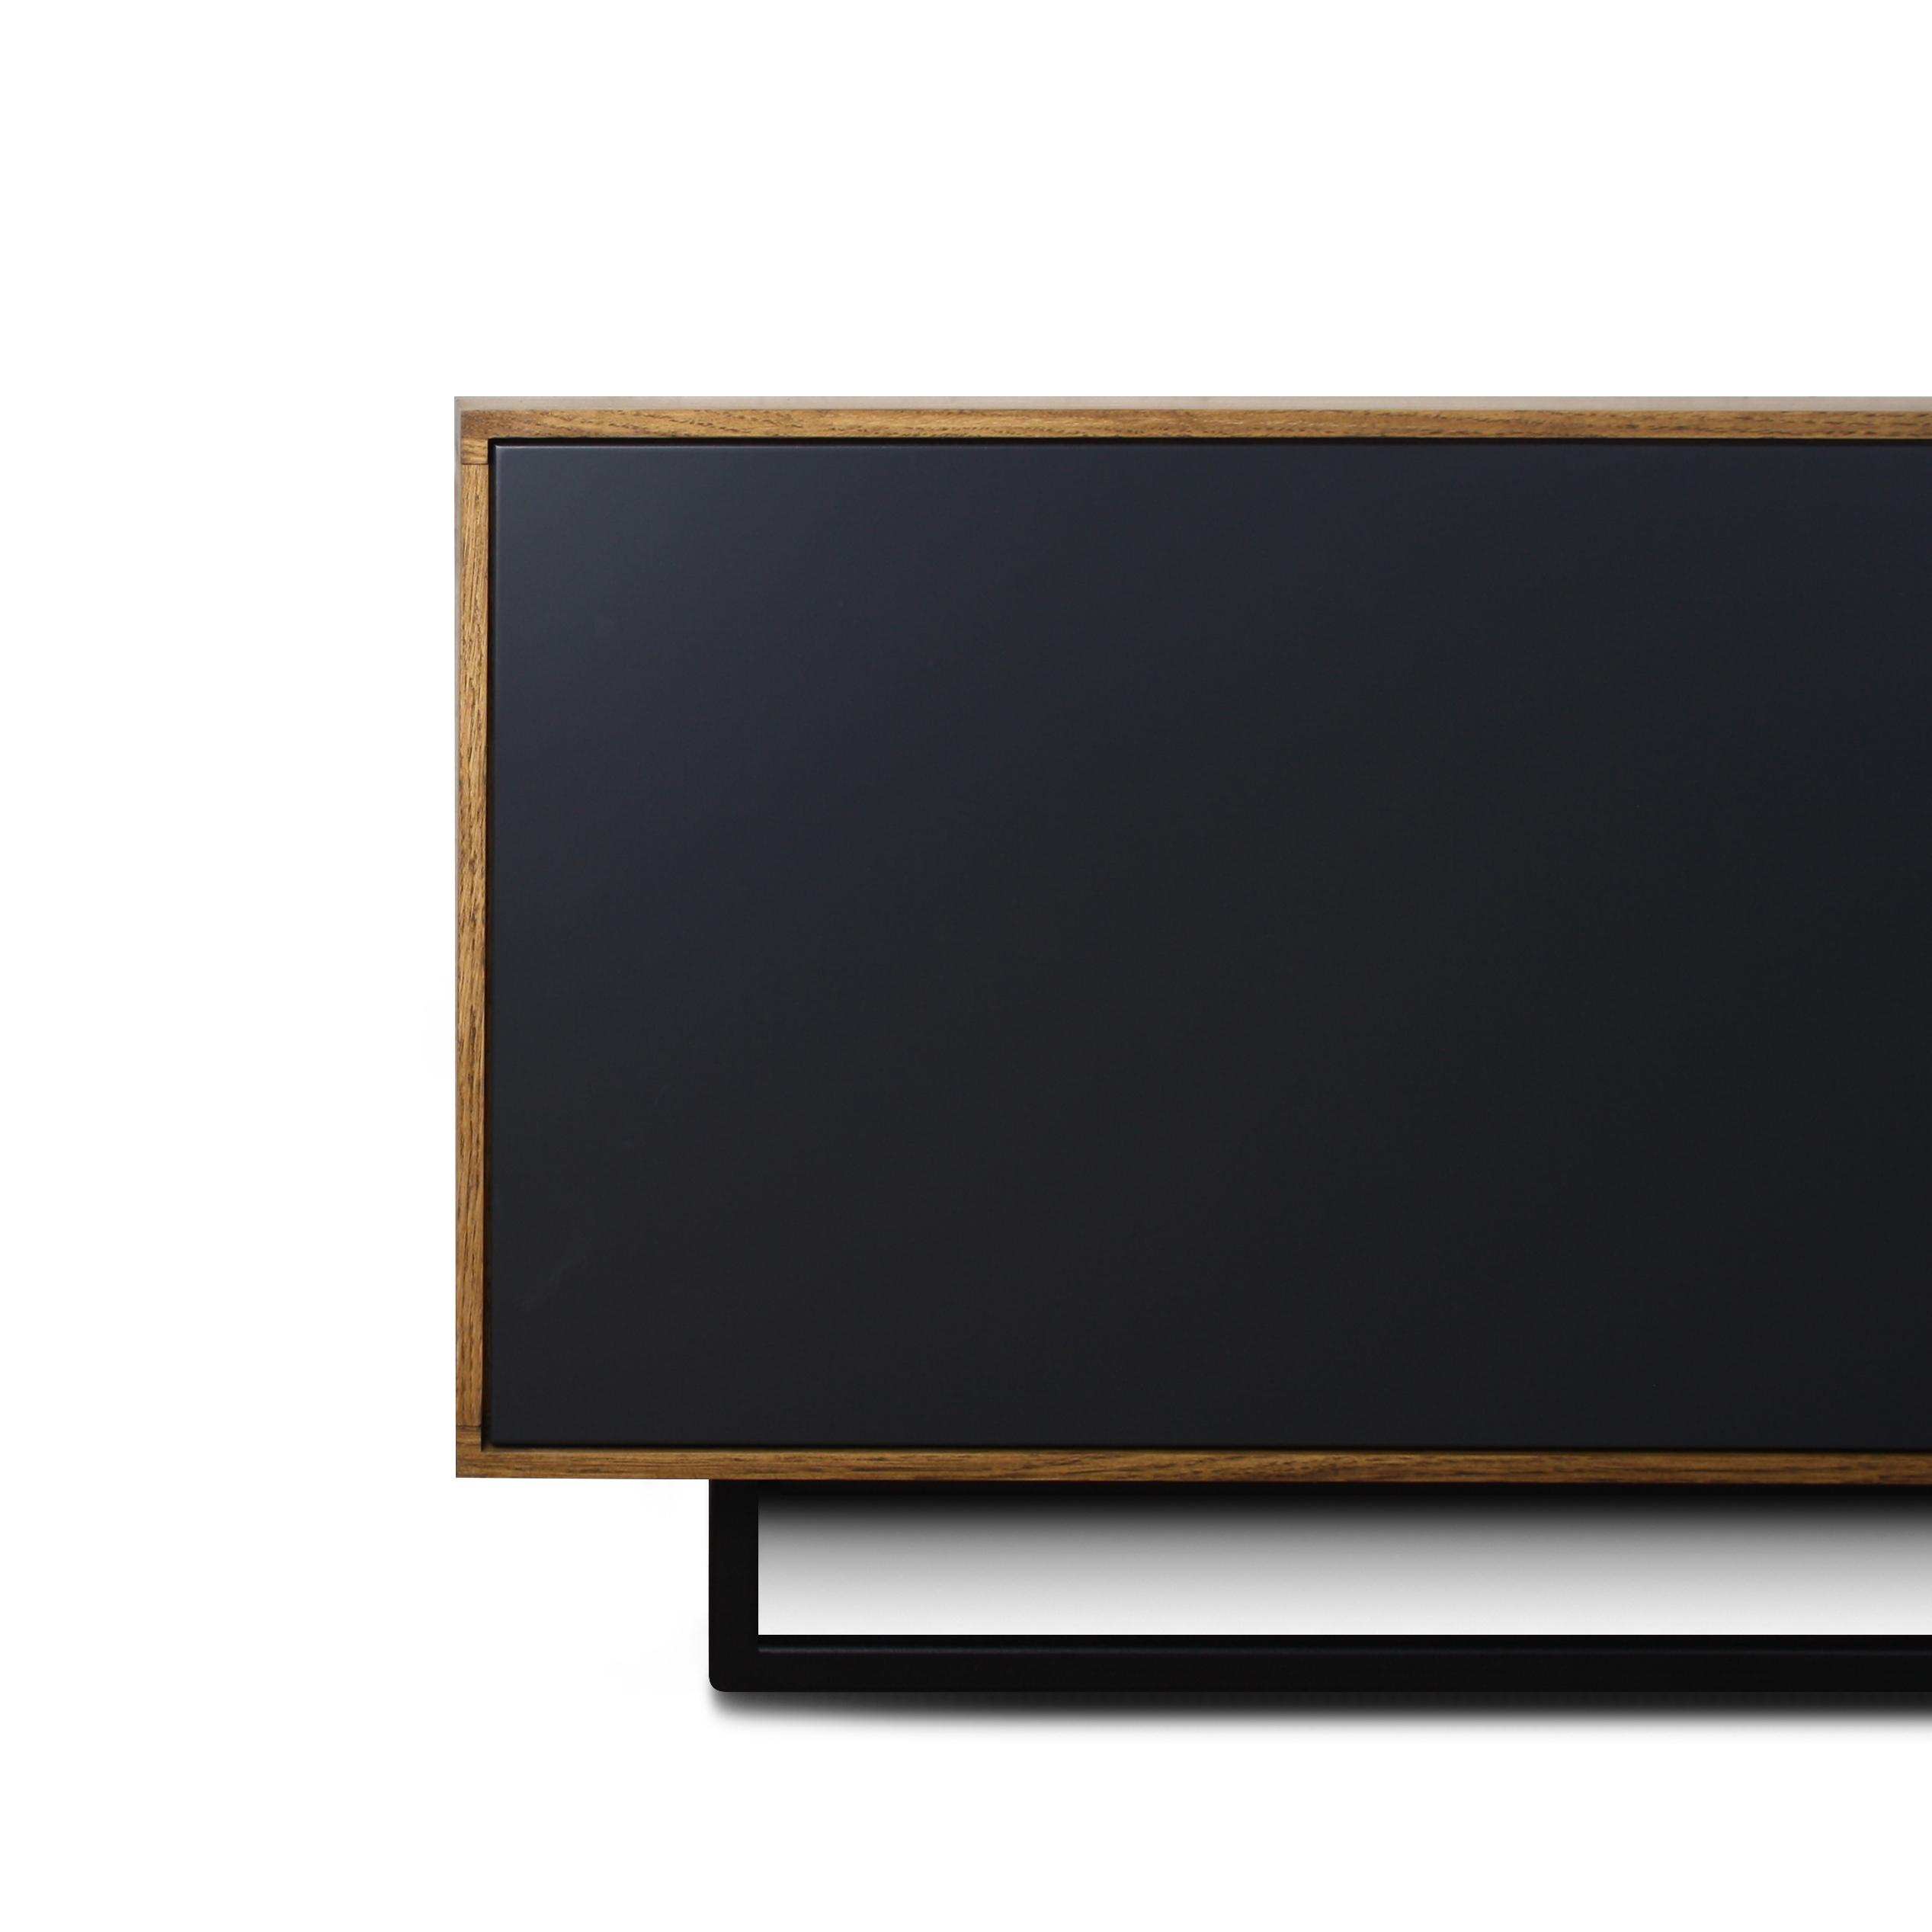 Juga-furniture-baldu-gamyba-vilniuje-tv-spintele-VILI-produktas-3